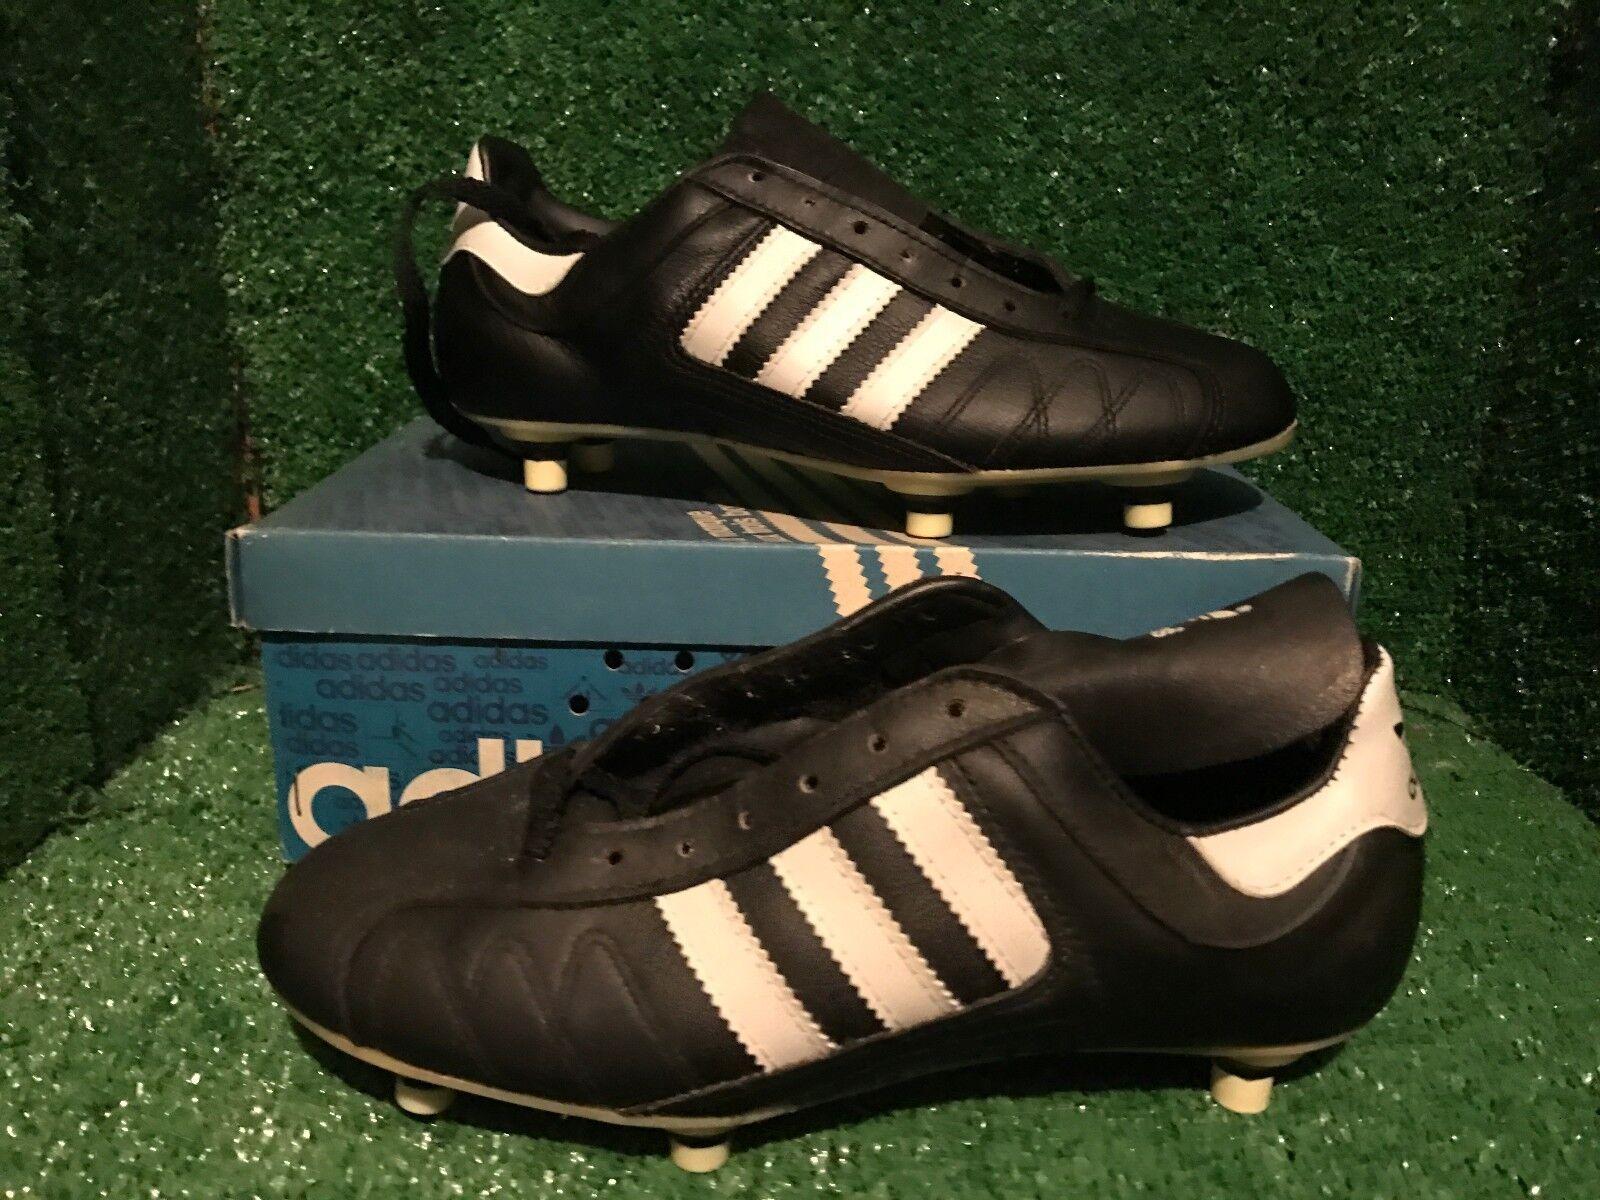 BNIB Adidas Barca Vintage Soccer Stiefel schuhe Cleats Multiple Größes Deadstock